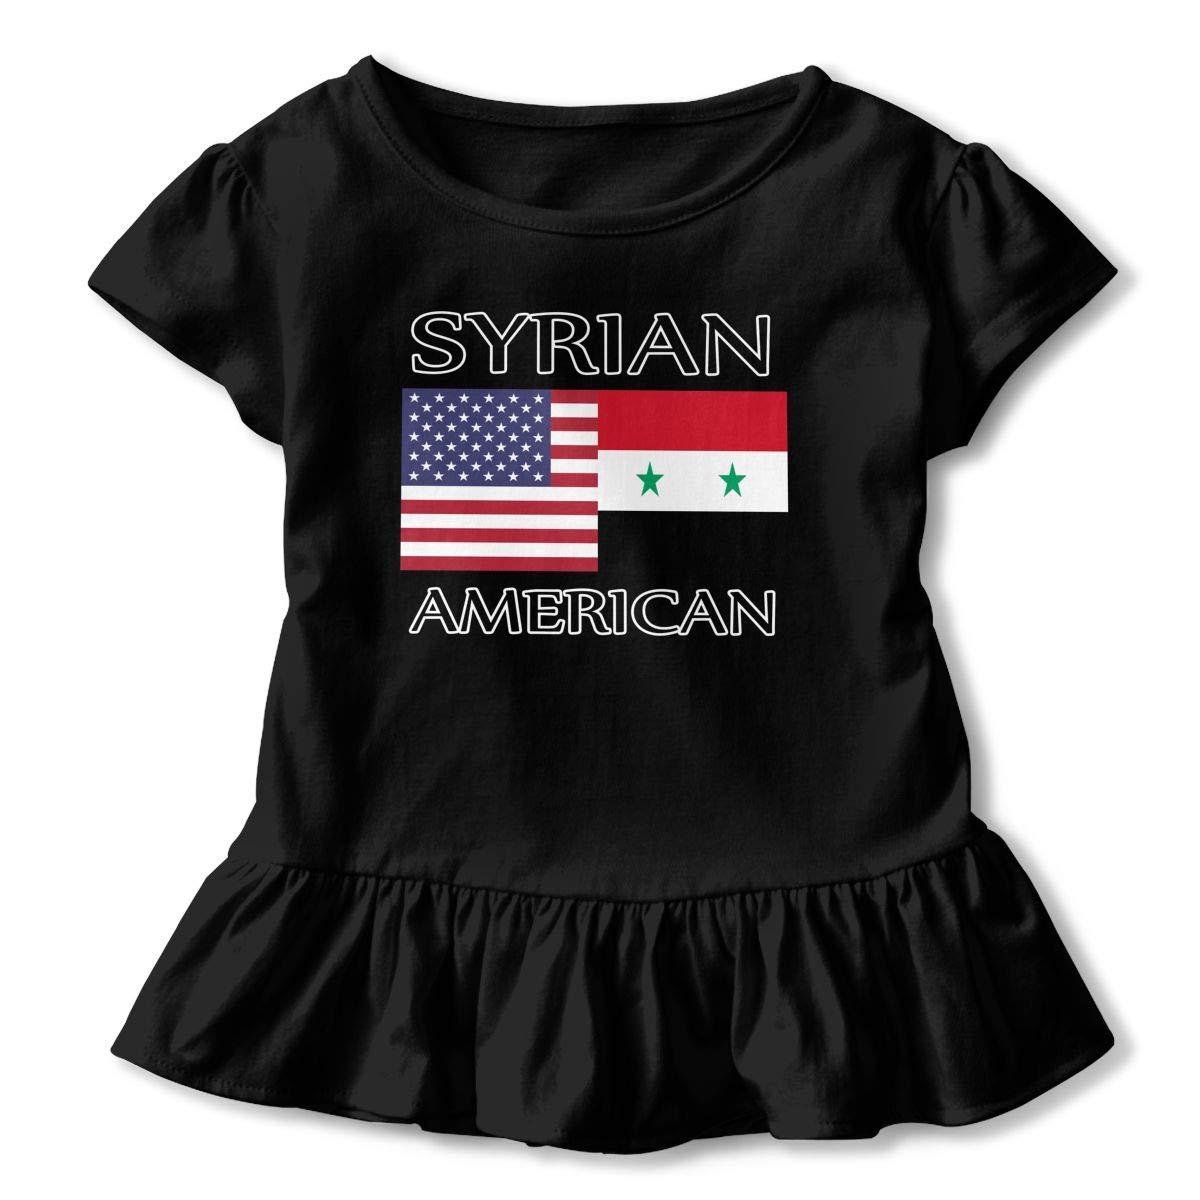 SHIRT1-KIDS Syrian American Flag Childrens Girls Short Sleeve Ruffles Shirt T-Shirt for 2-6 Toddlers